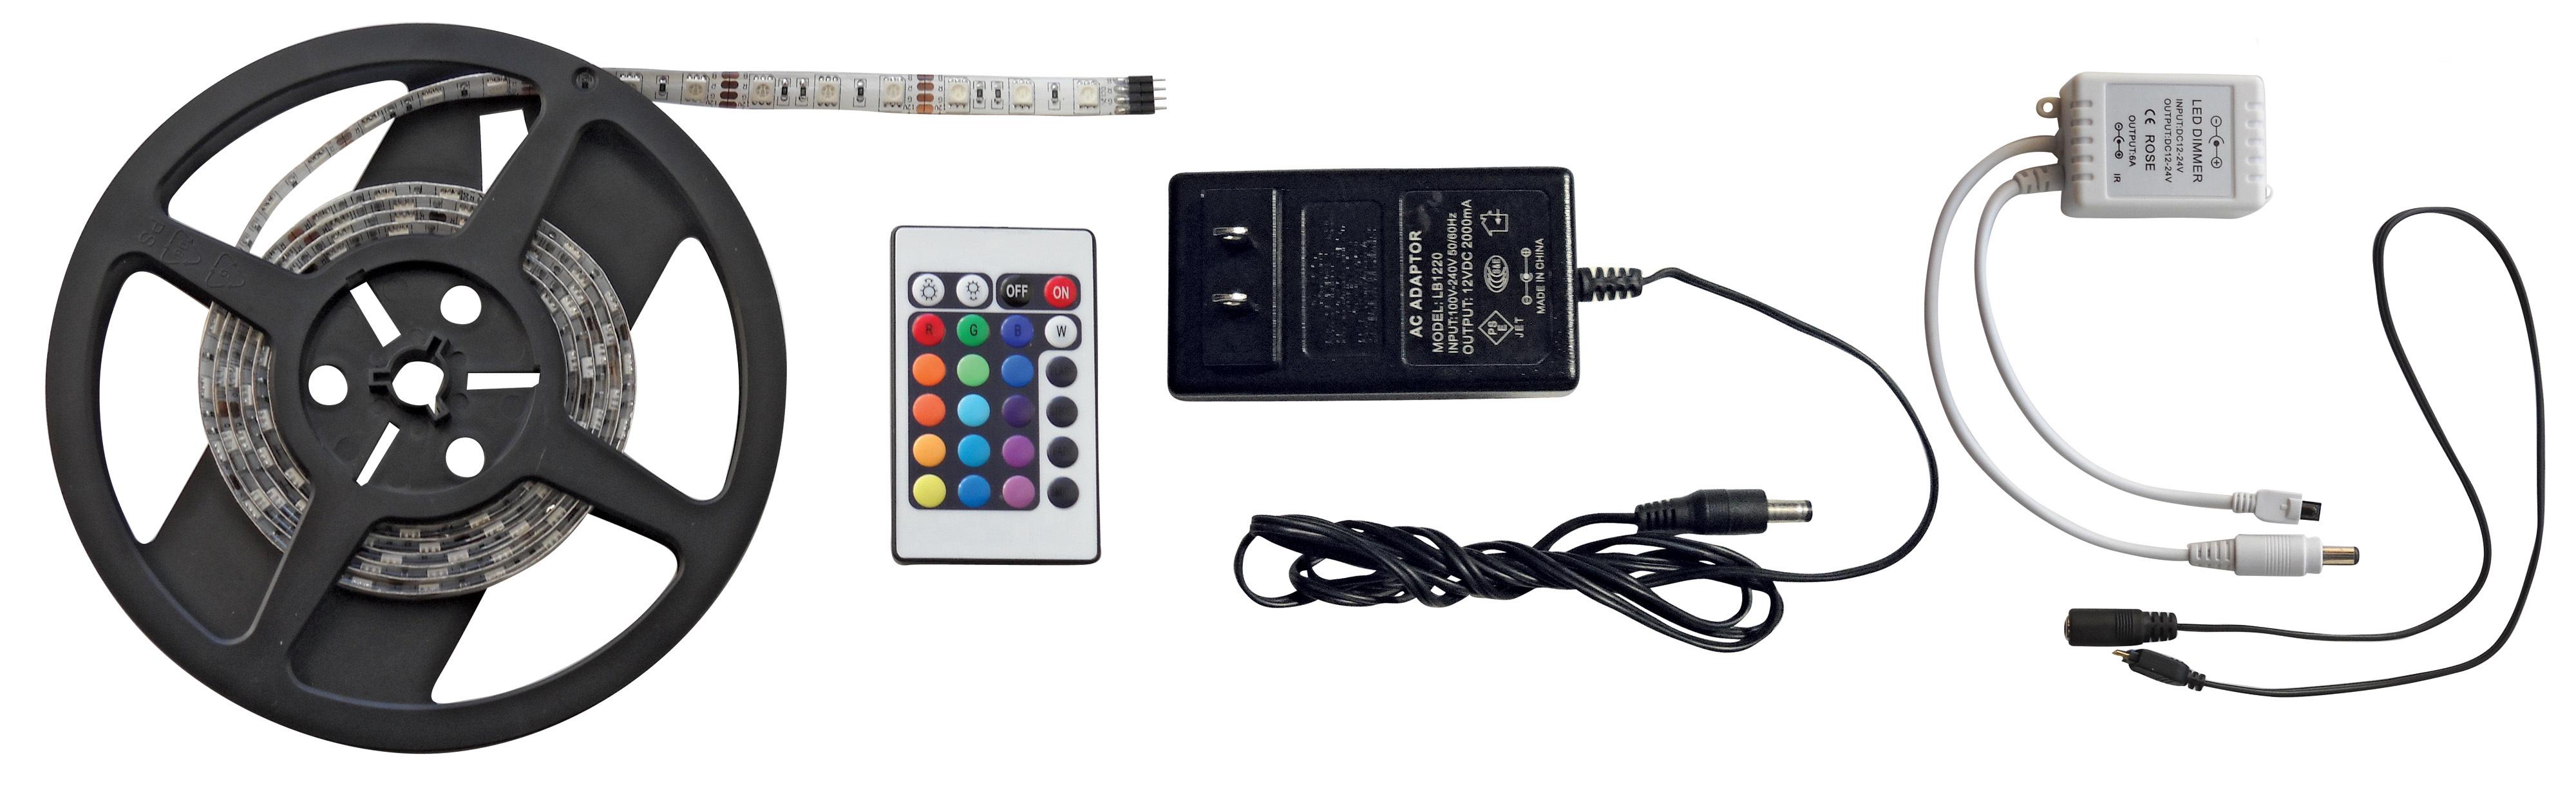 6 Foot RGB LED Strip Light Kit 52687